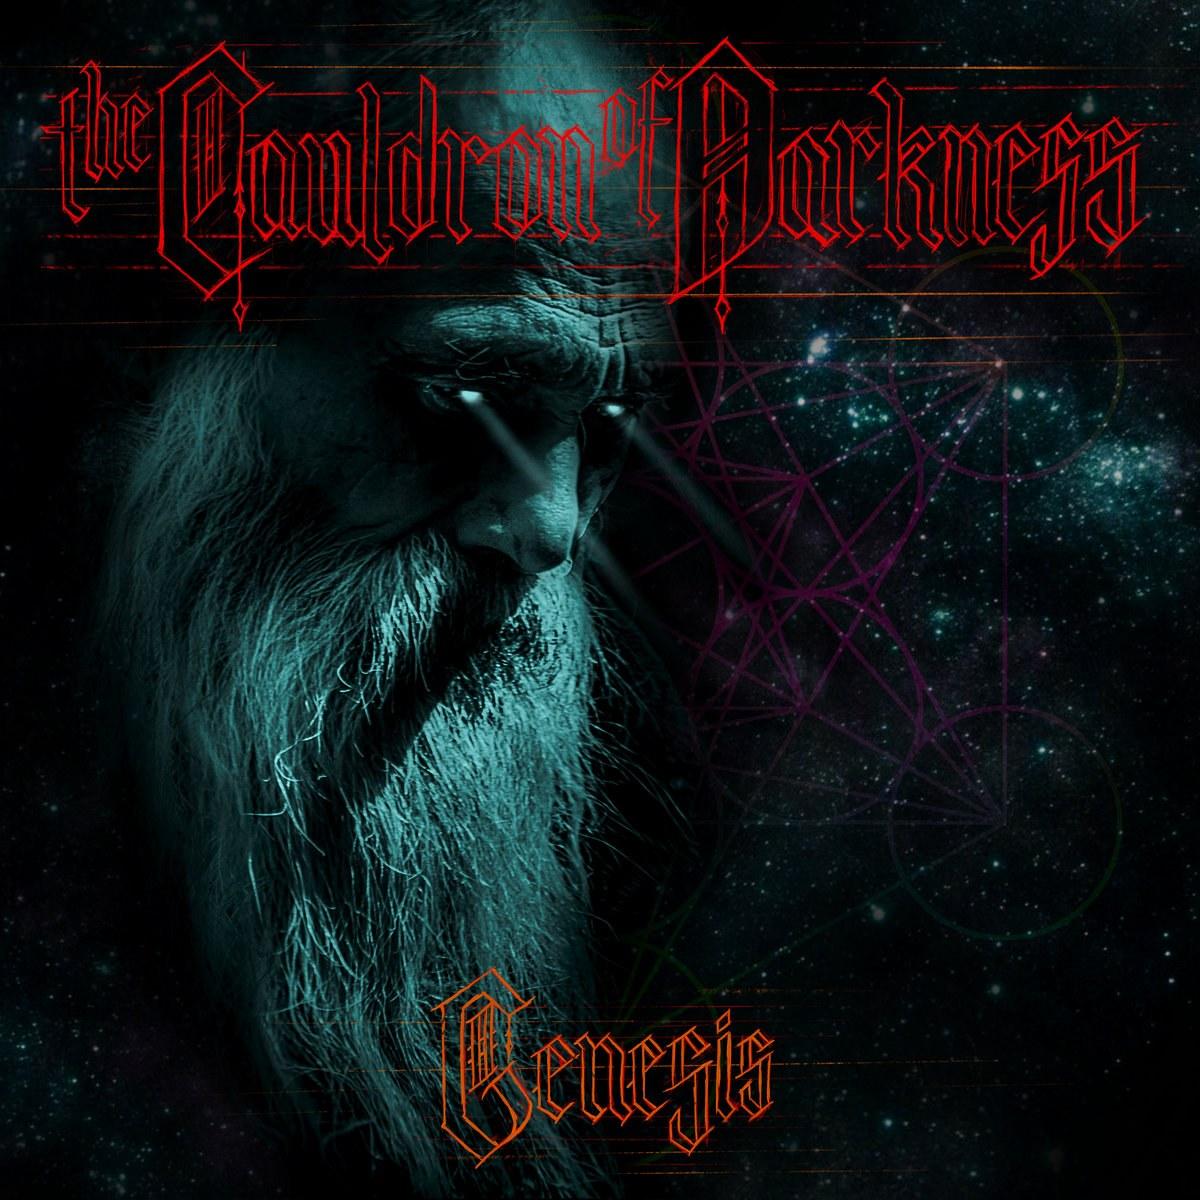 The Cauldron of Darkness - Genesis